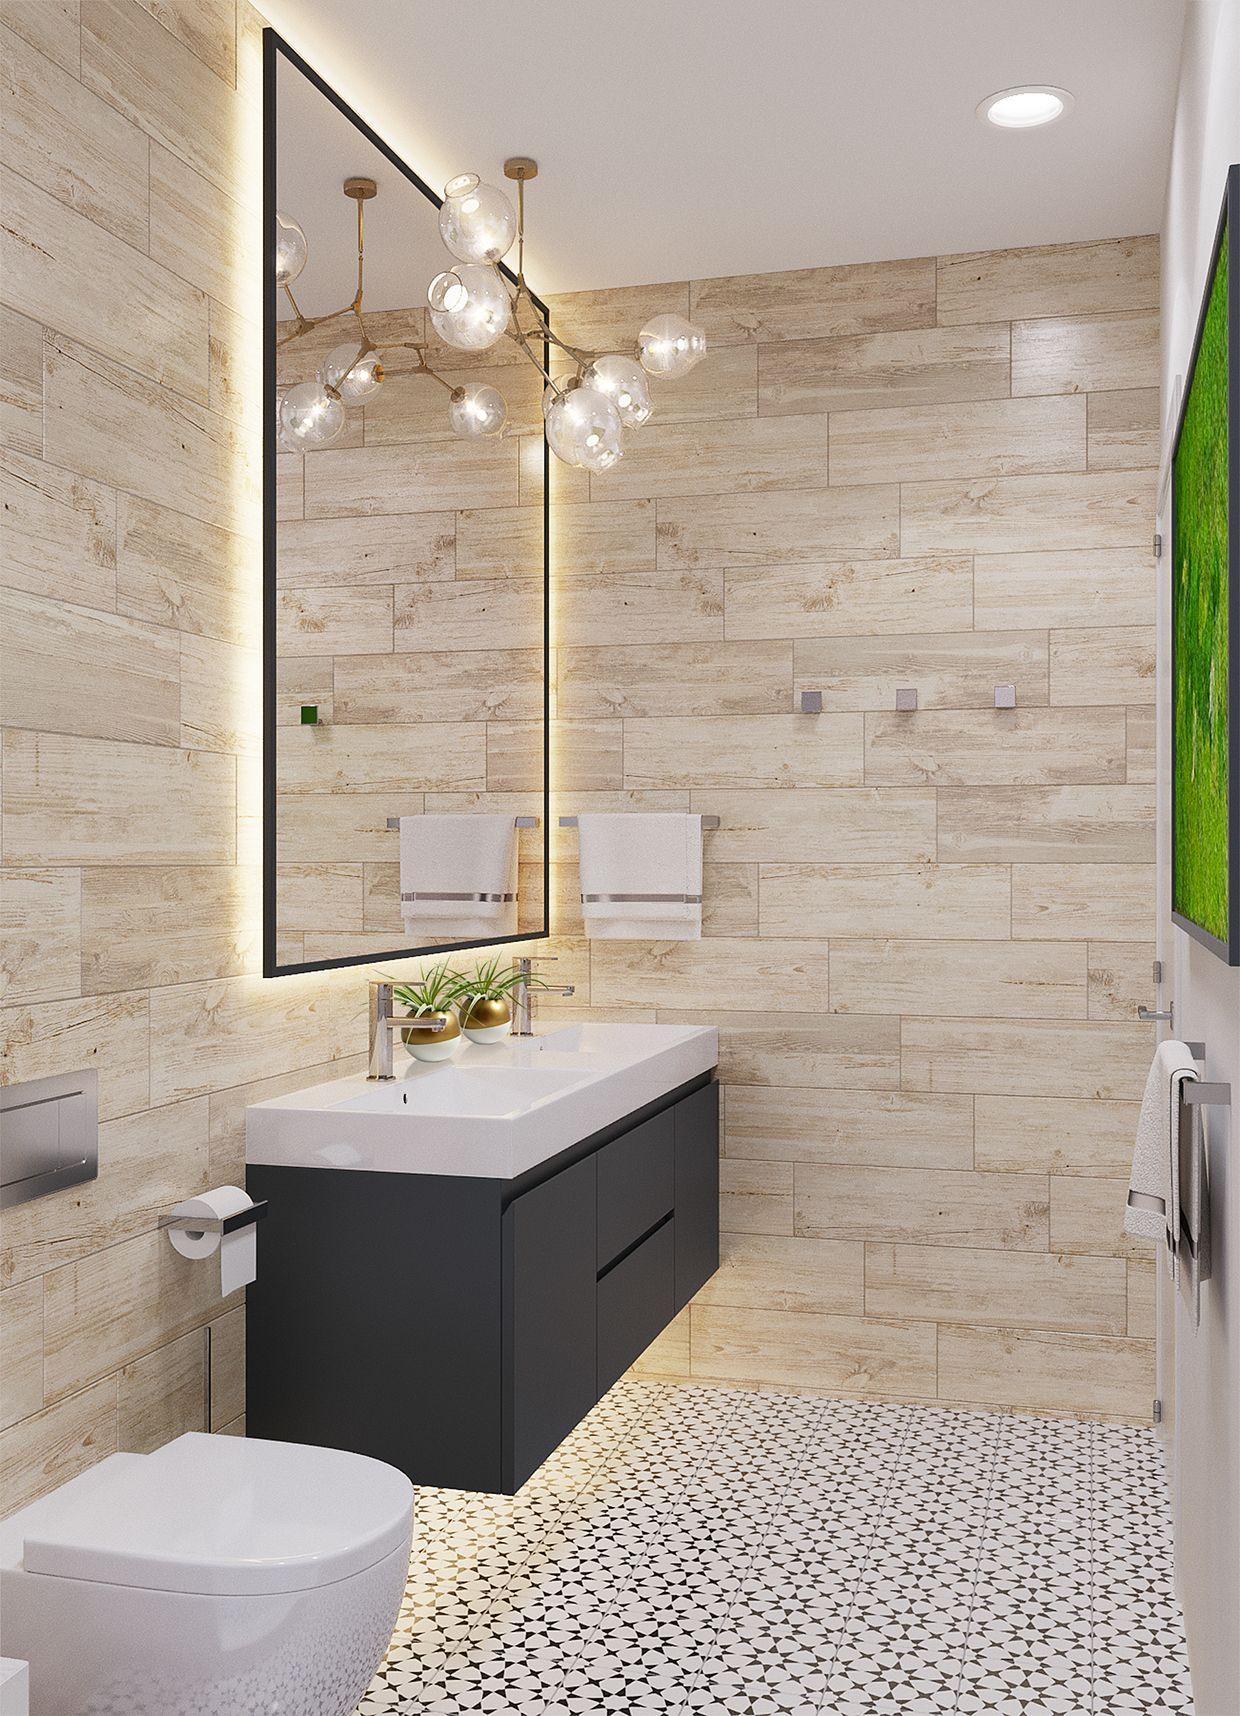 Phrase Deco Salle De Bain ~ 8260ec54788551 5a5d0c4d887ad Jpg 1240 1716 Bathroom Pinterest